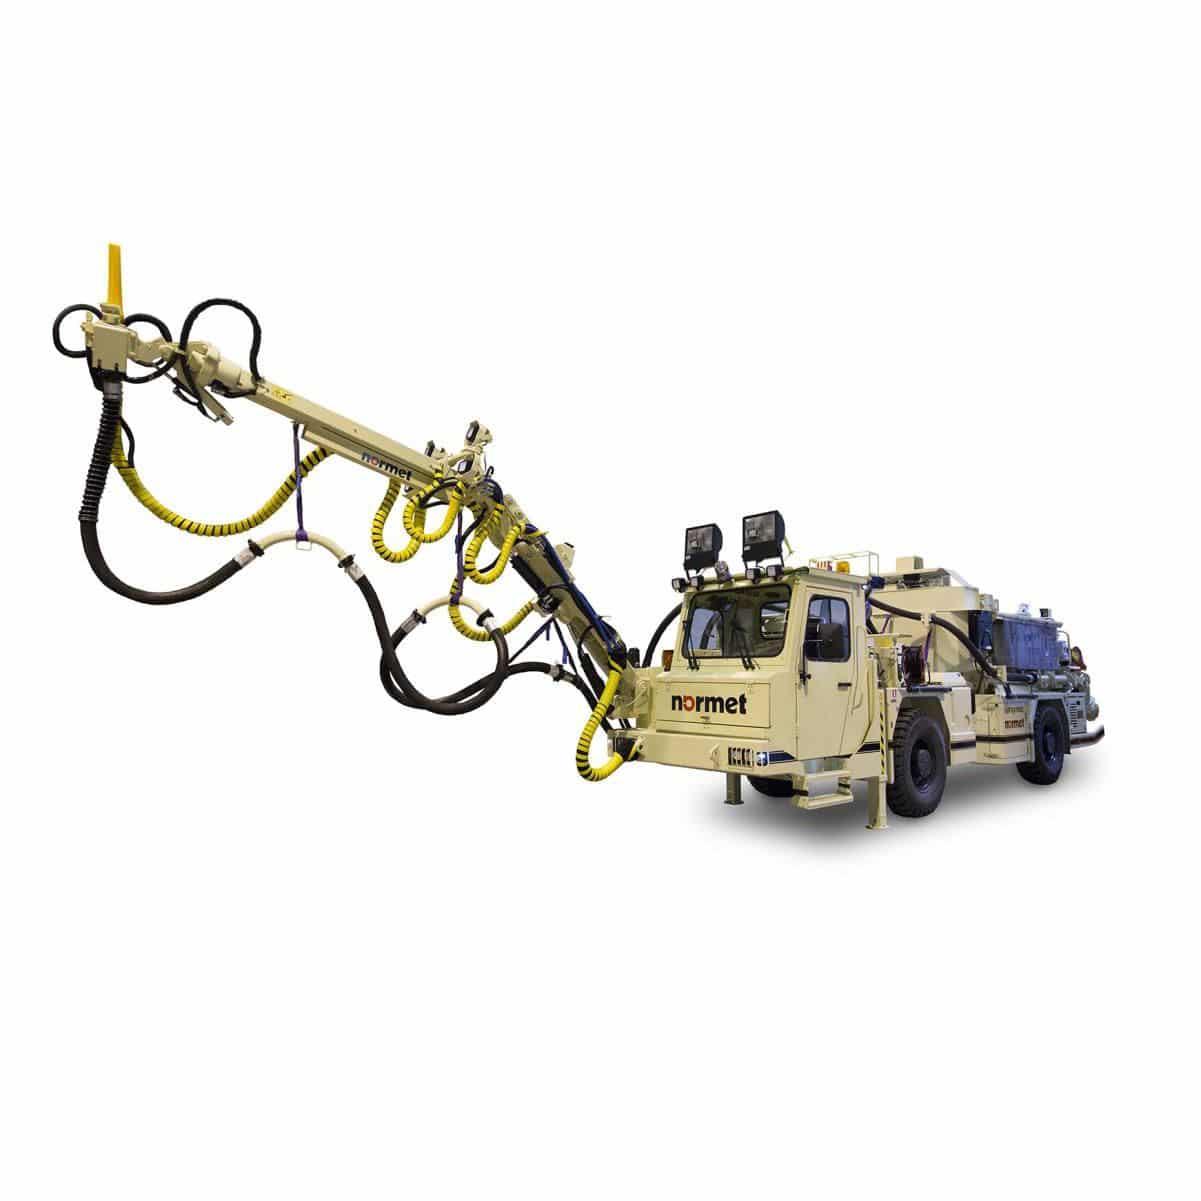 Concrete spraying machine / articulated arm - Spraymec MF